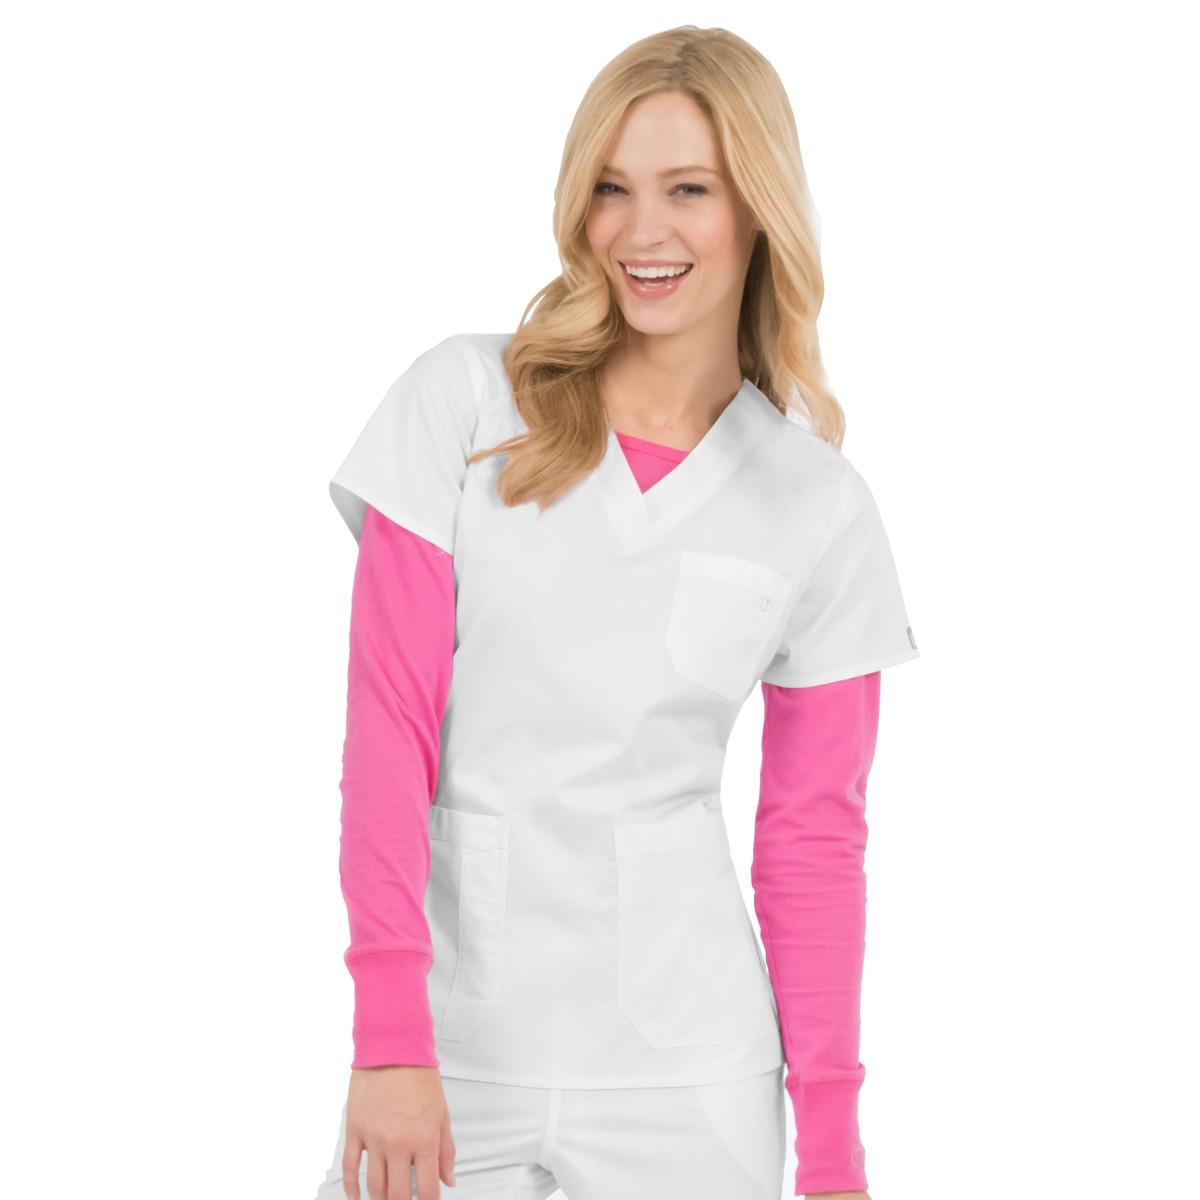 a6b38a82b10 Med Couture / MC2 Niki Top in White | Shop Scrub Tops Now